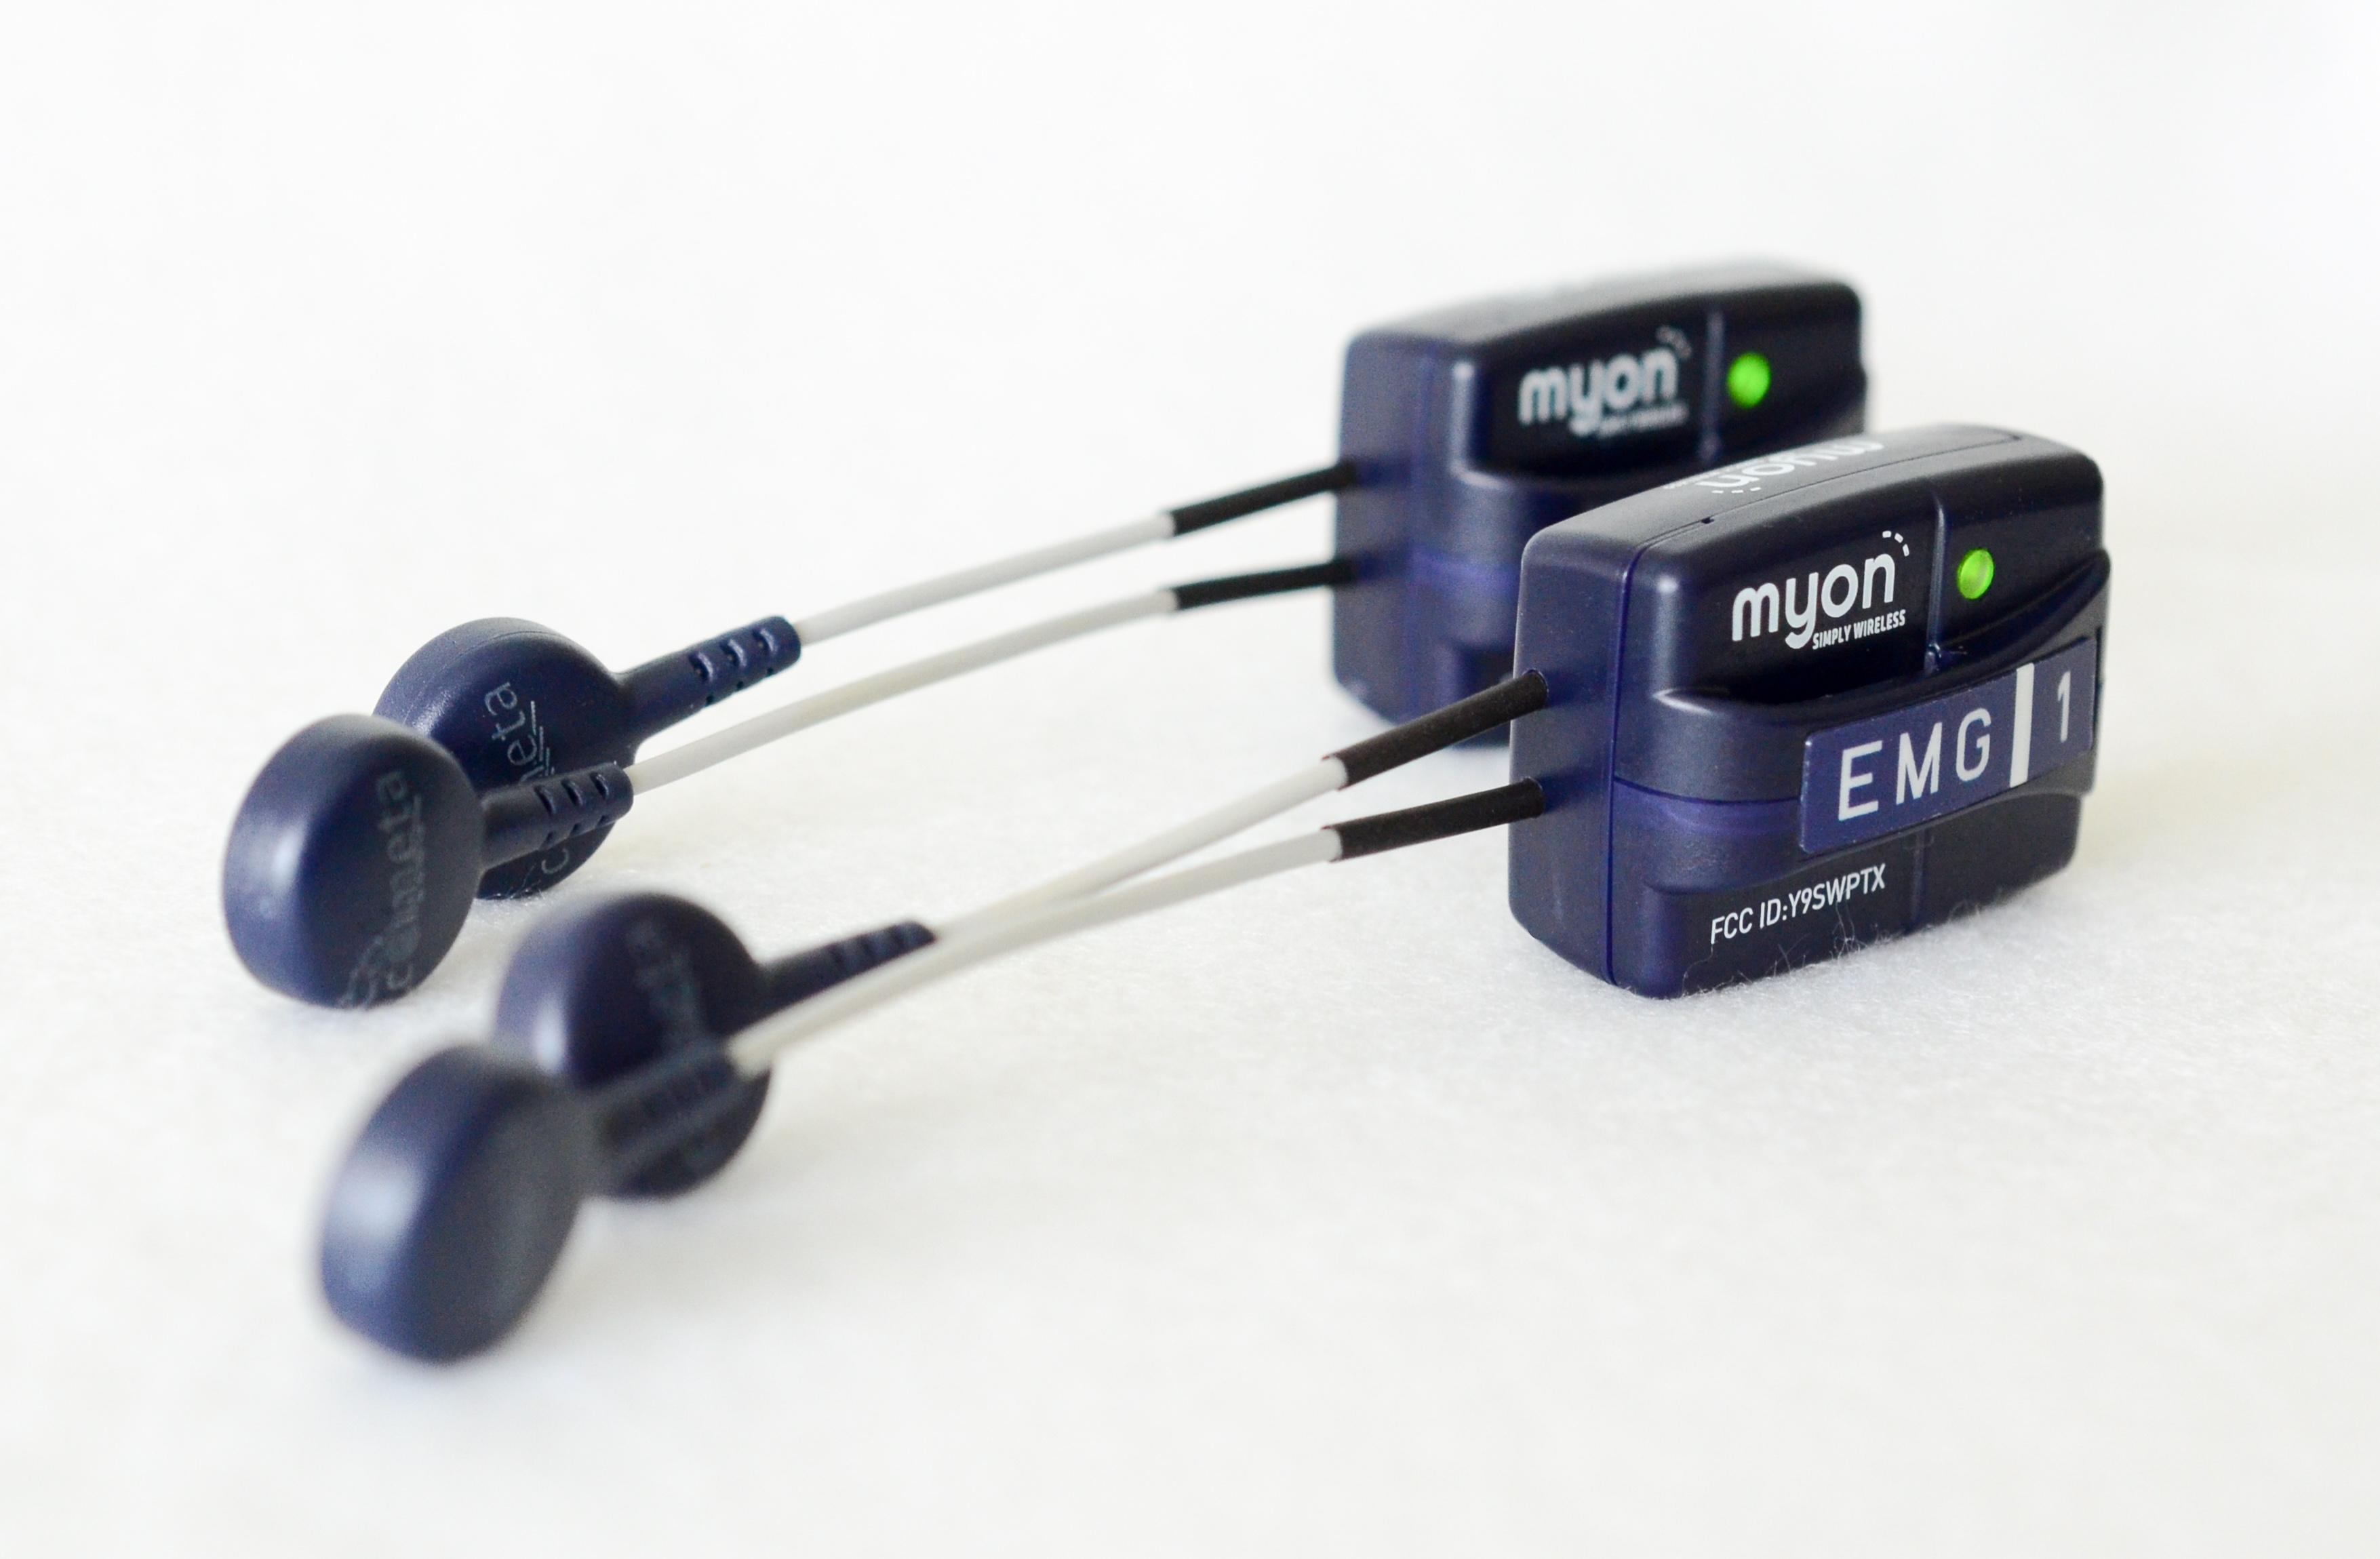 aktos-mini EMG